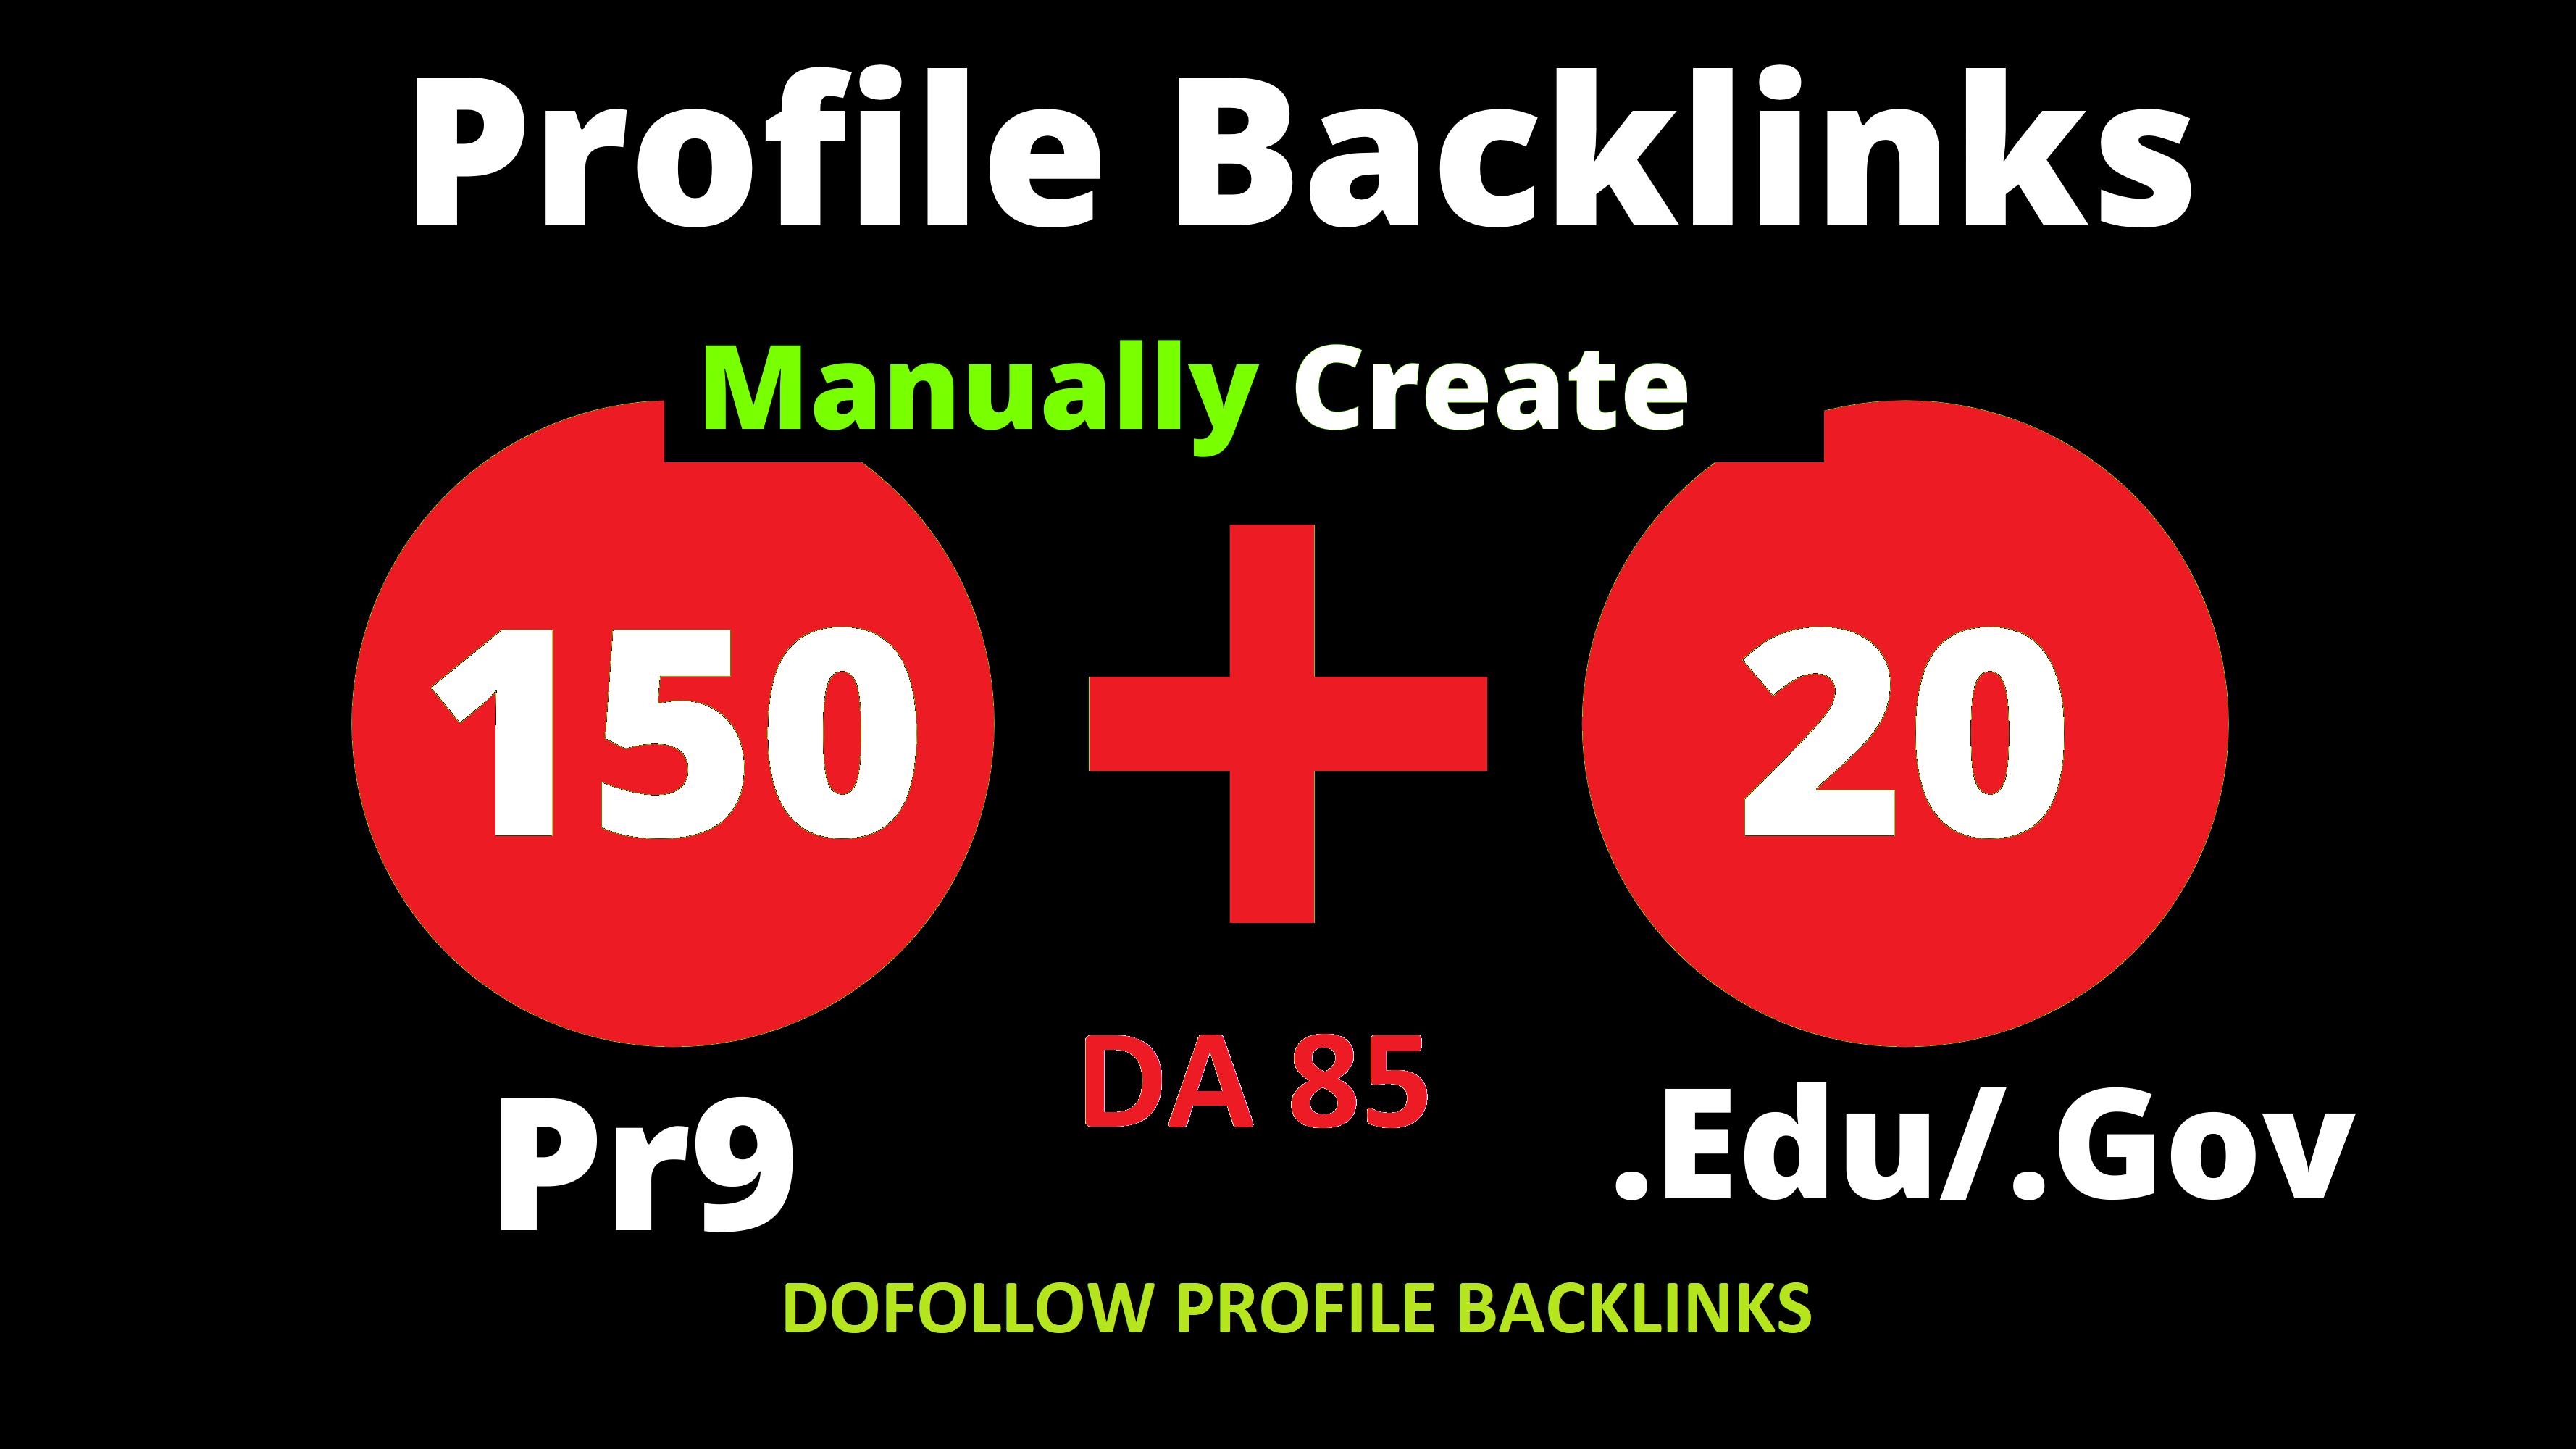 150 Pr9 + 20 Edu/Gov Pr9 High Authority Profile Backlinks To Boost Your Website Ranking 2021